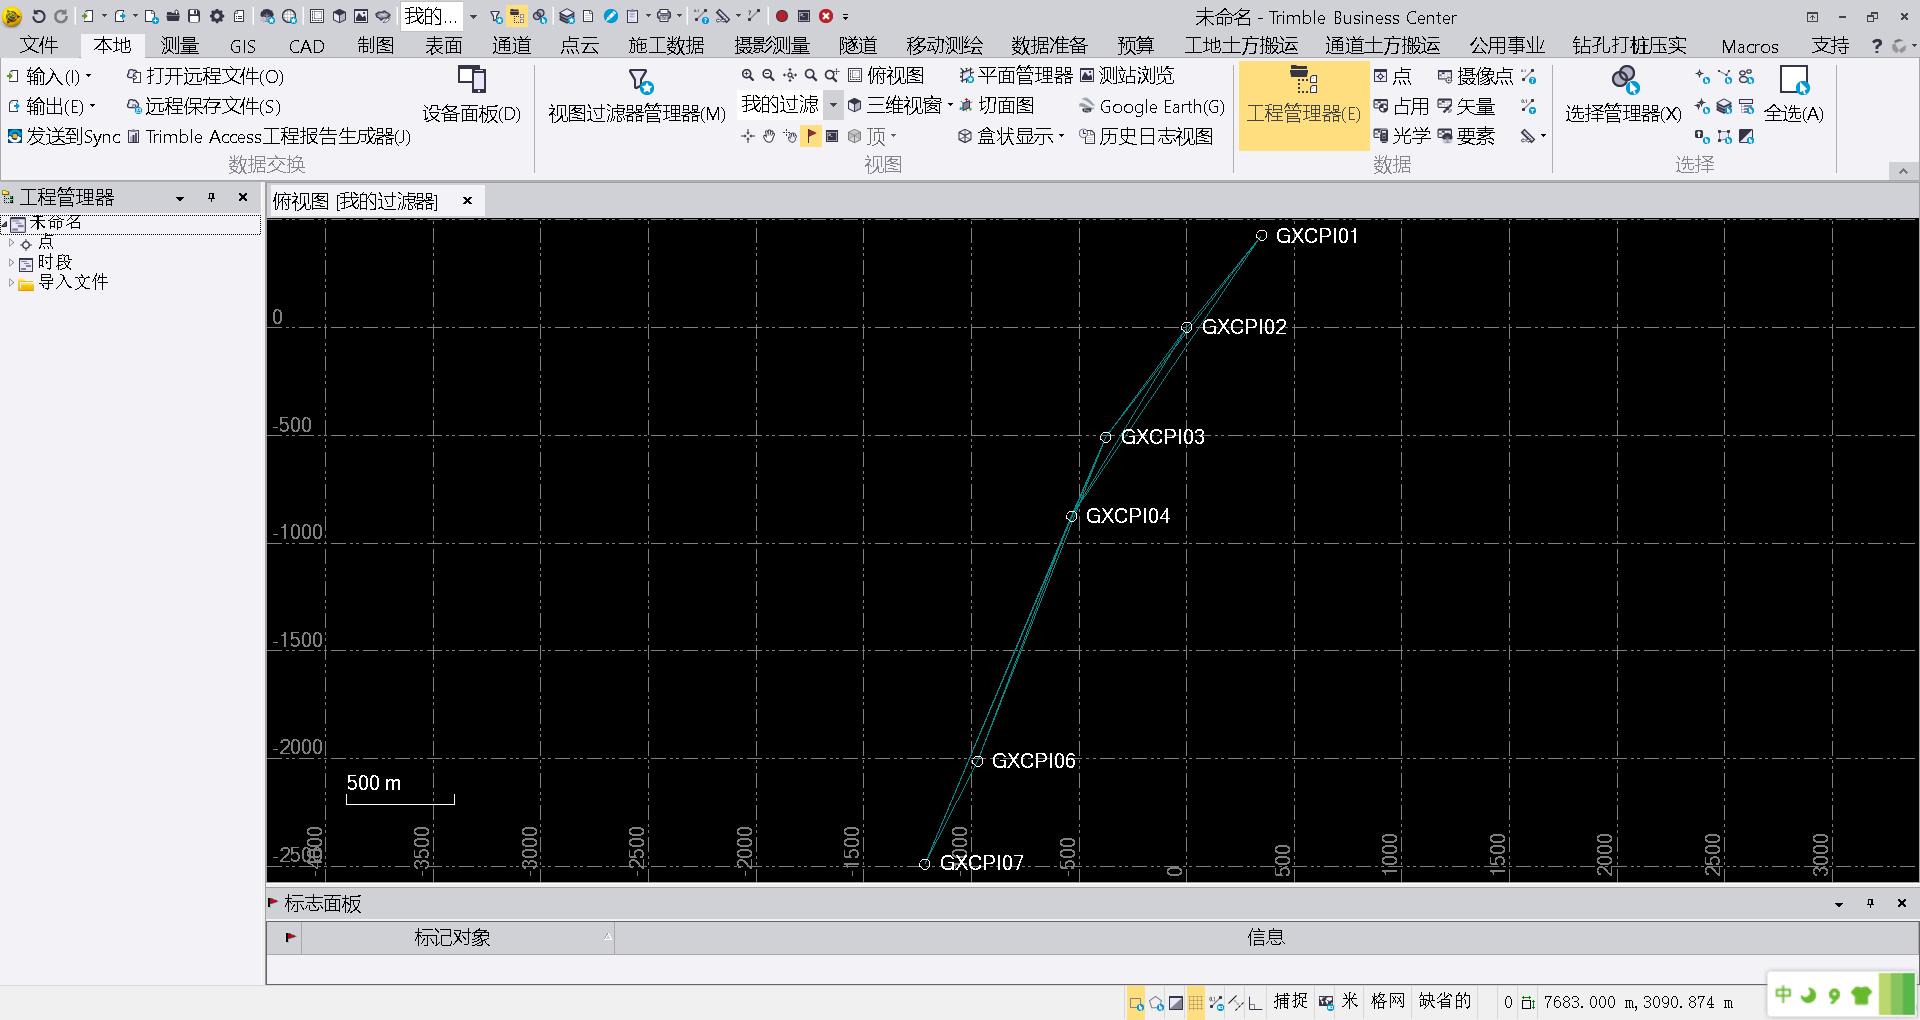 TBC软件中显示的控制网网图